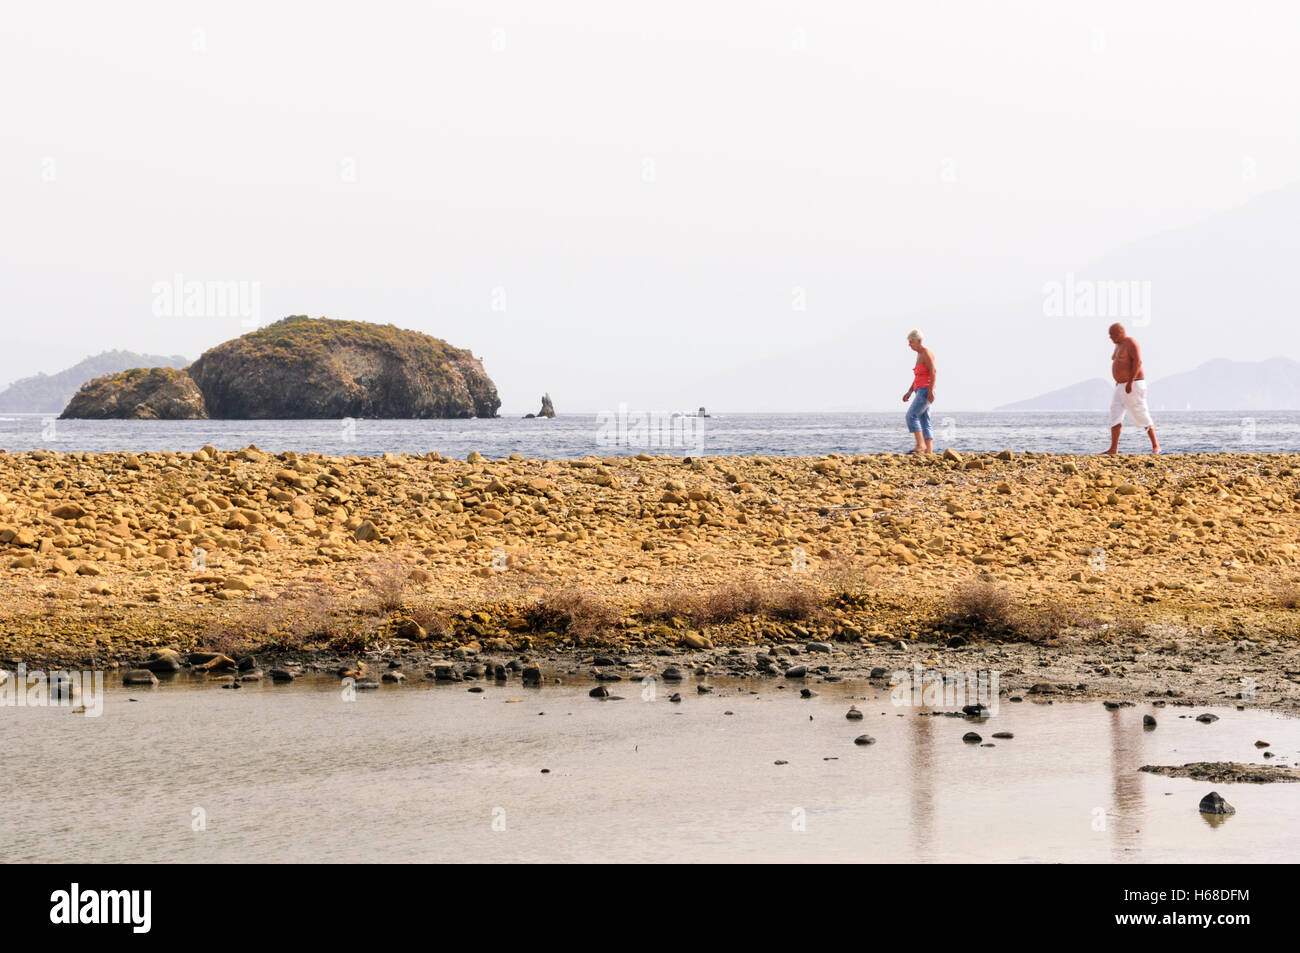 Two people walk along a stony beach on a Turkish island - Stock Image